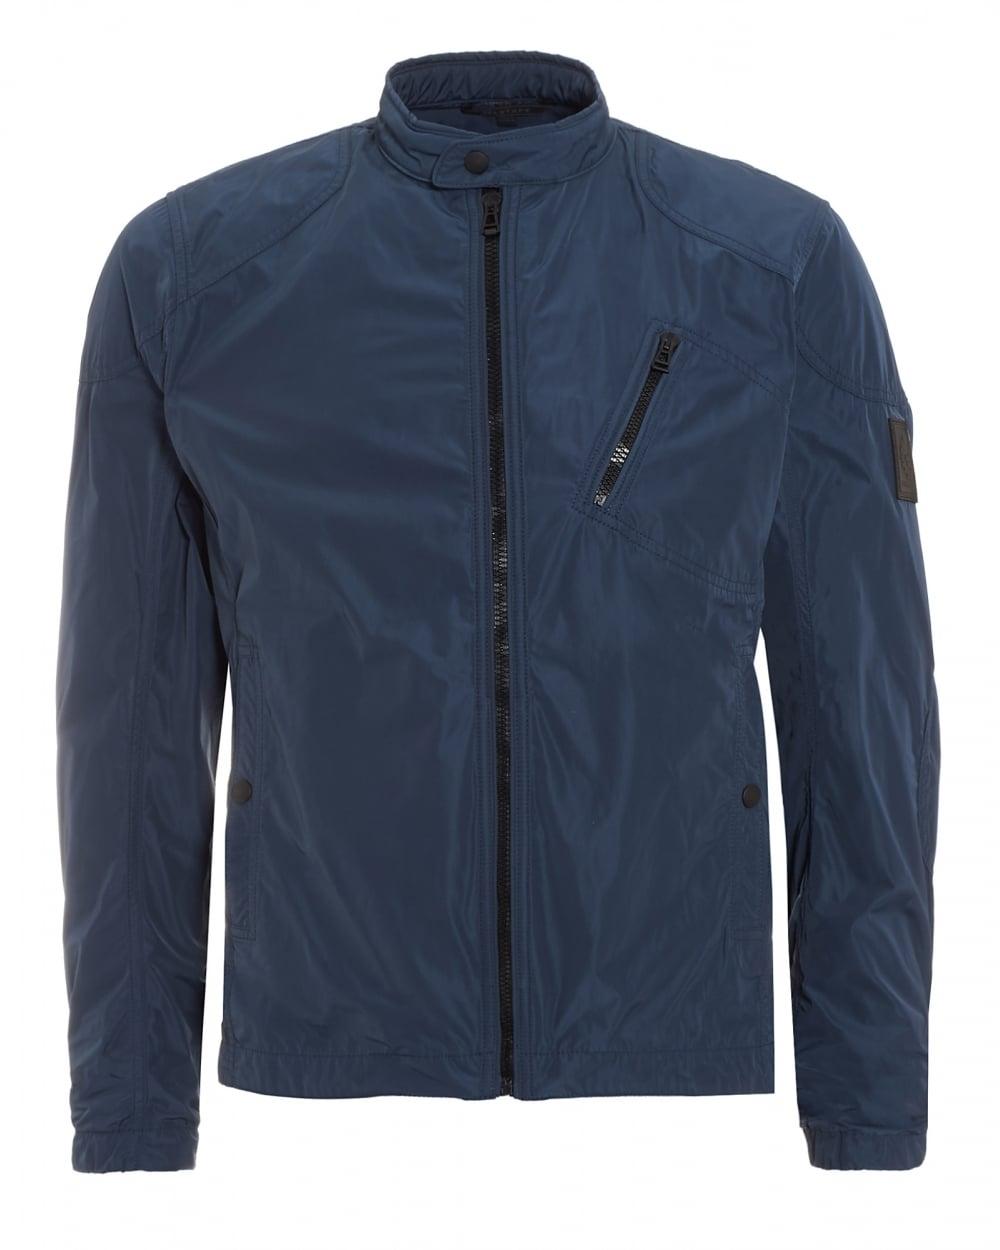 1776447634 Belstaff Mens Stapleford Blouson Jacket